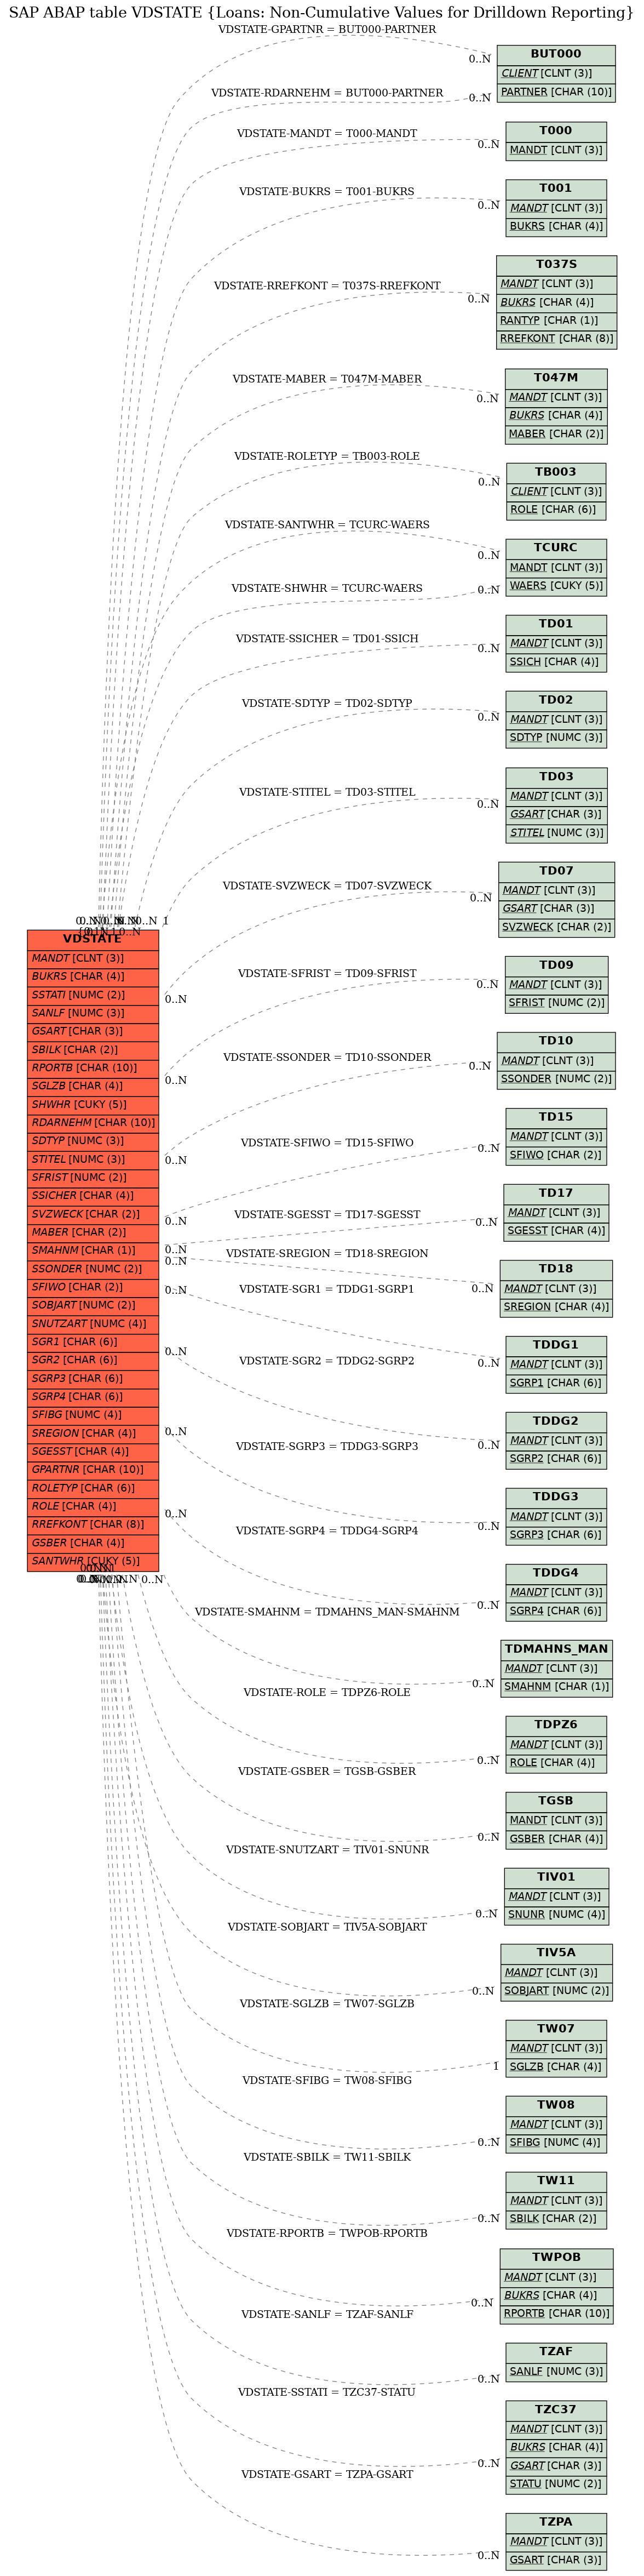 E-R Diagram for table VDSTATE (Loans: Non-Cumulative Values for Drilldown Reporting)